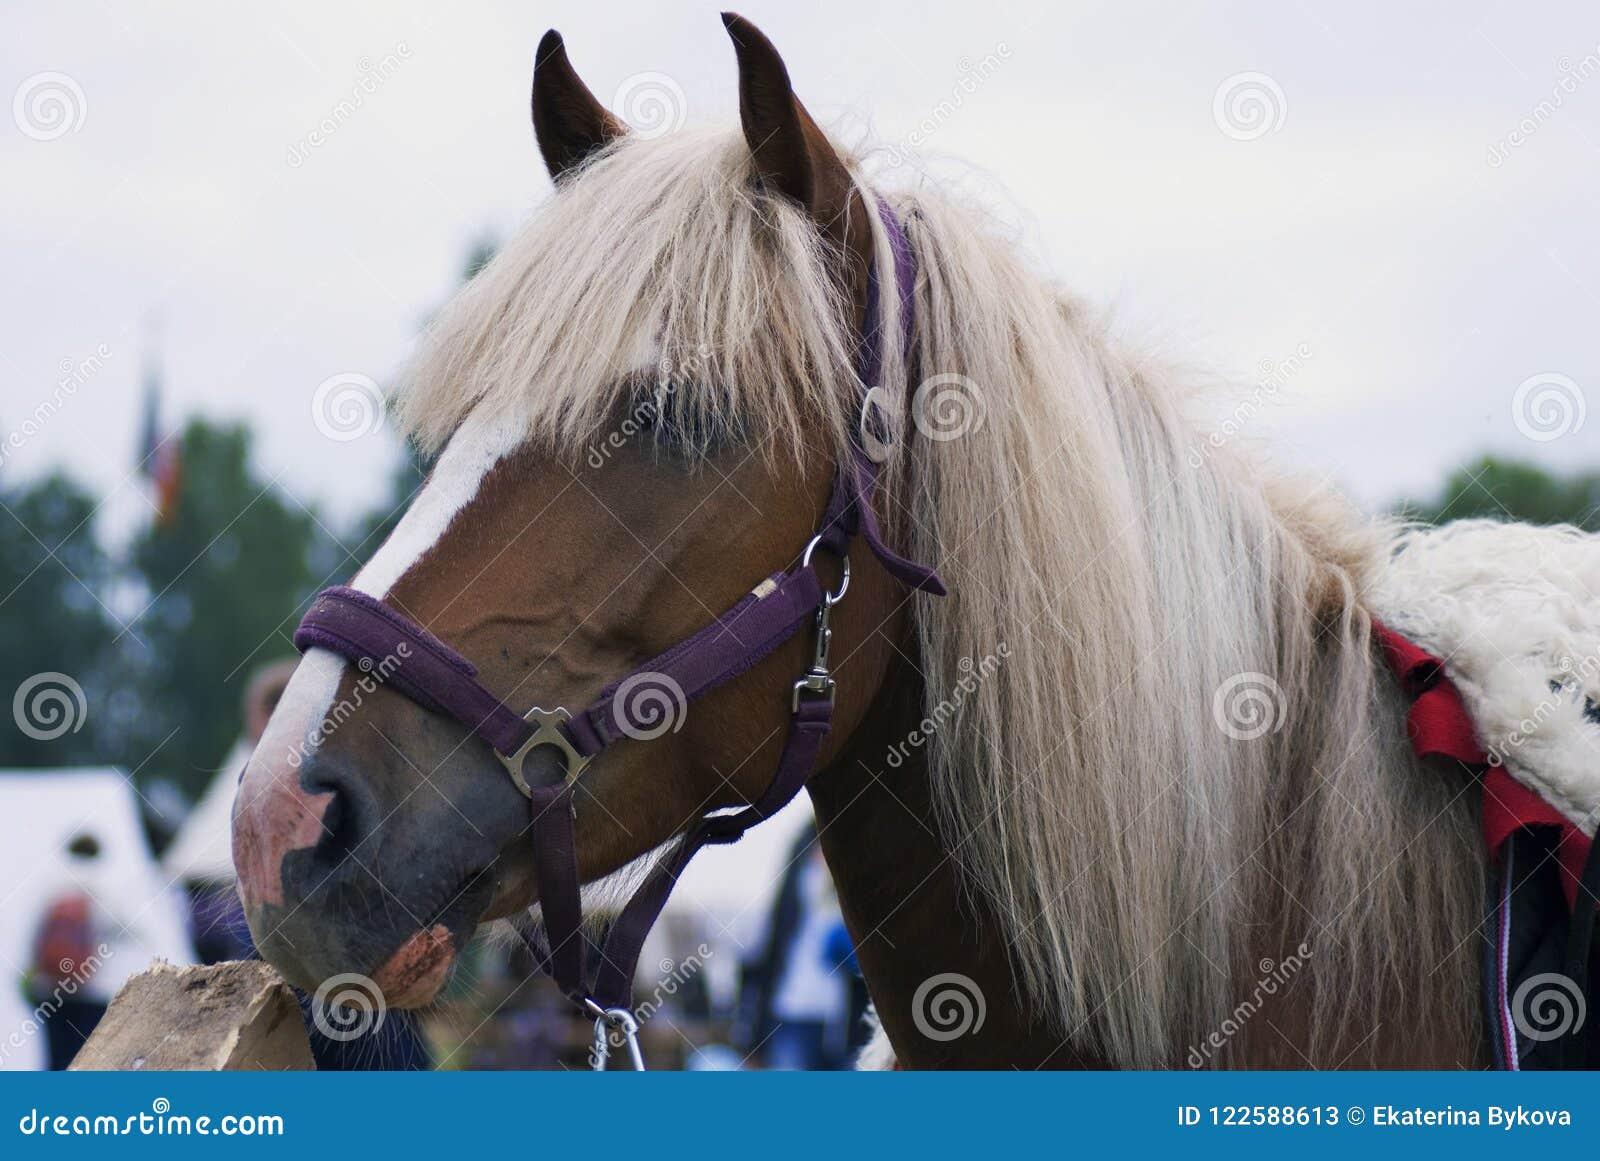 Horse Head Portrait The Animal Has Long White Hair Stock Image